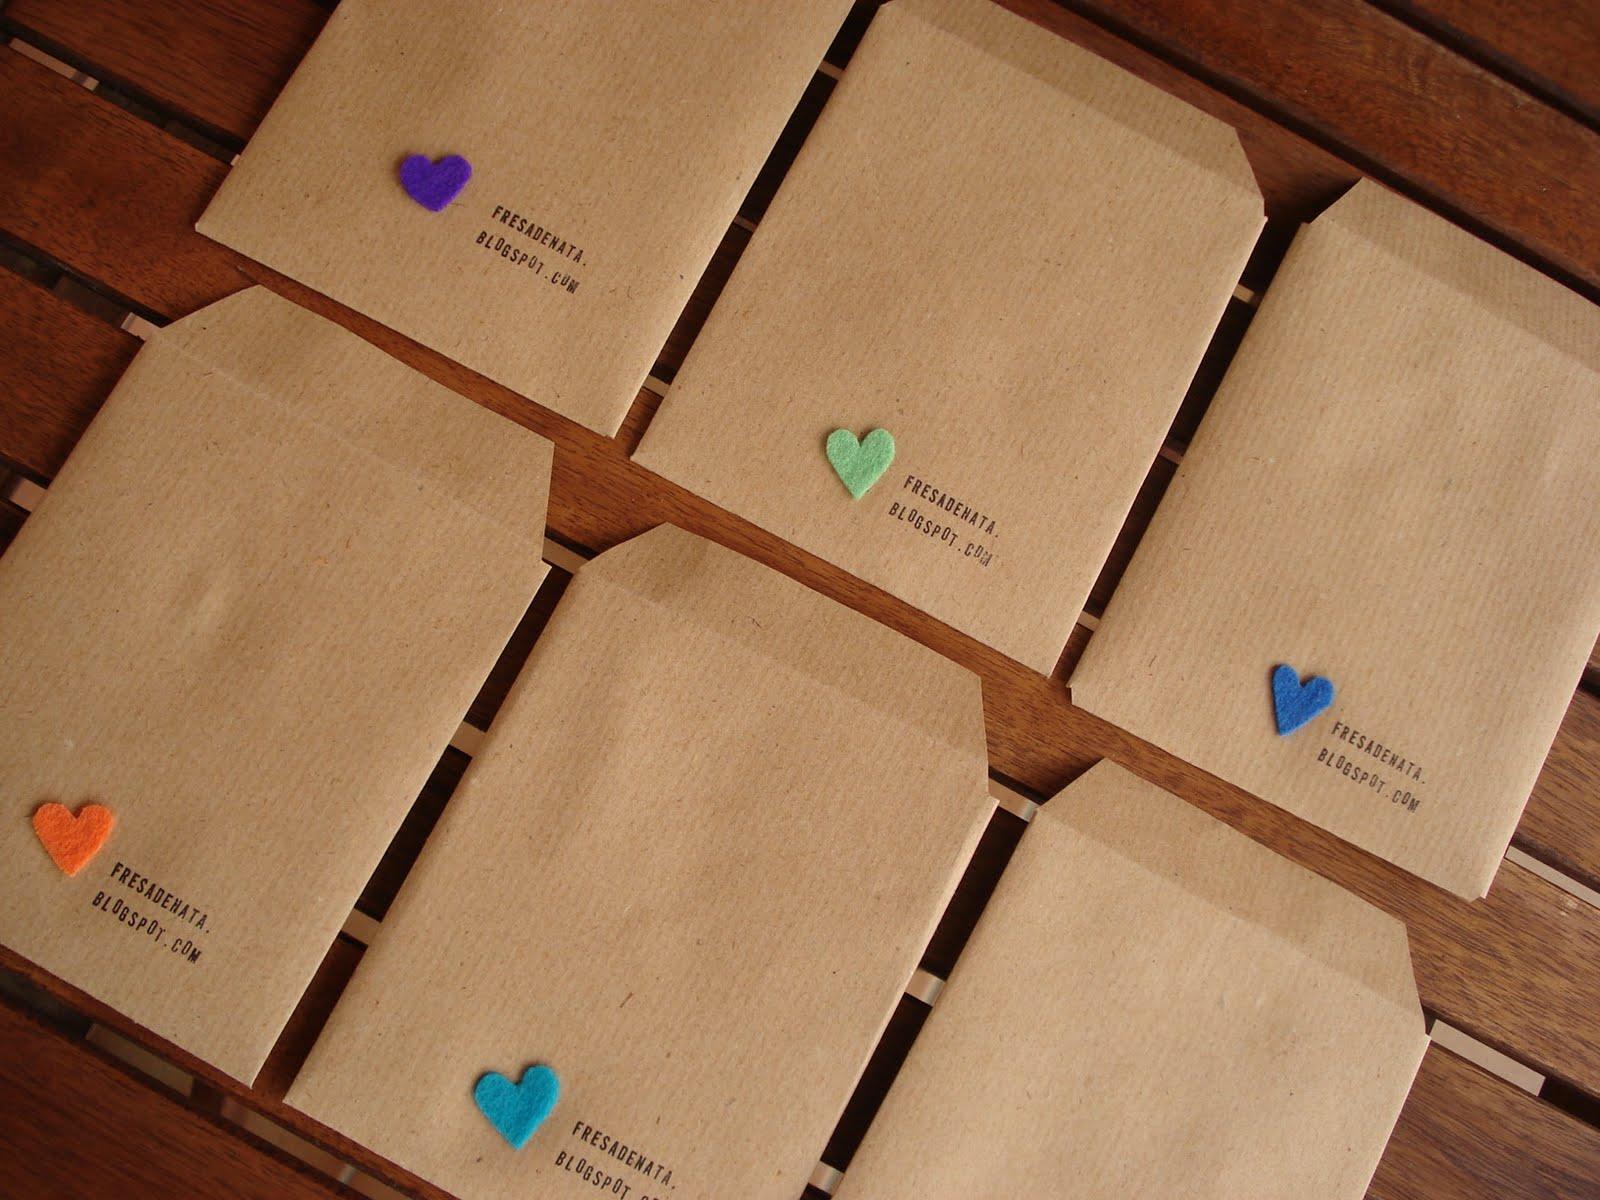 Sobres de papel kraft manualidades pinterest crafts - Manualidades en papel ...